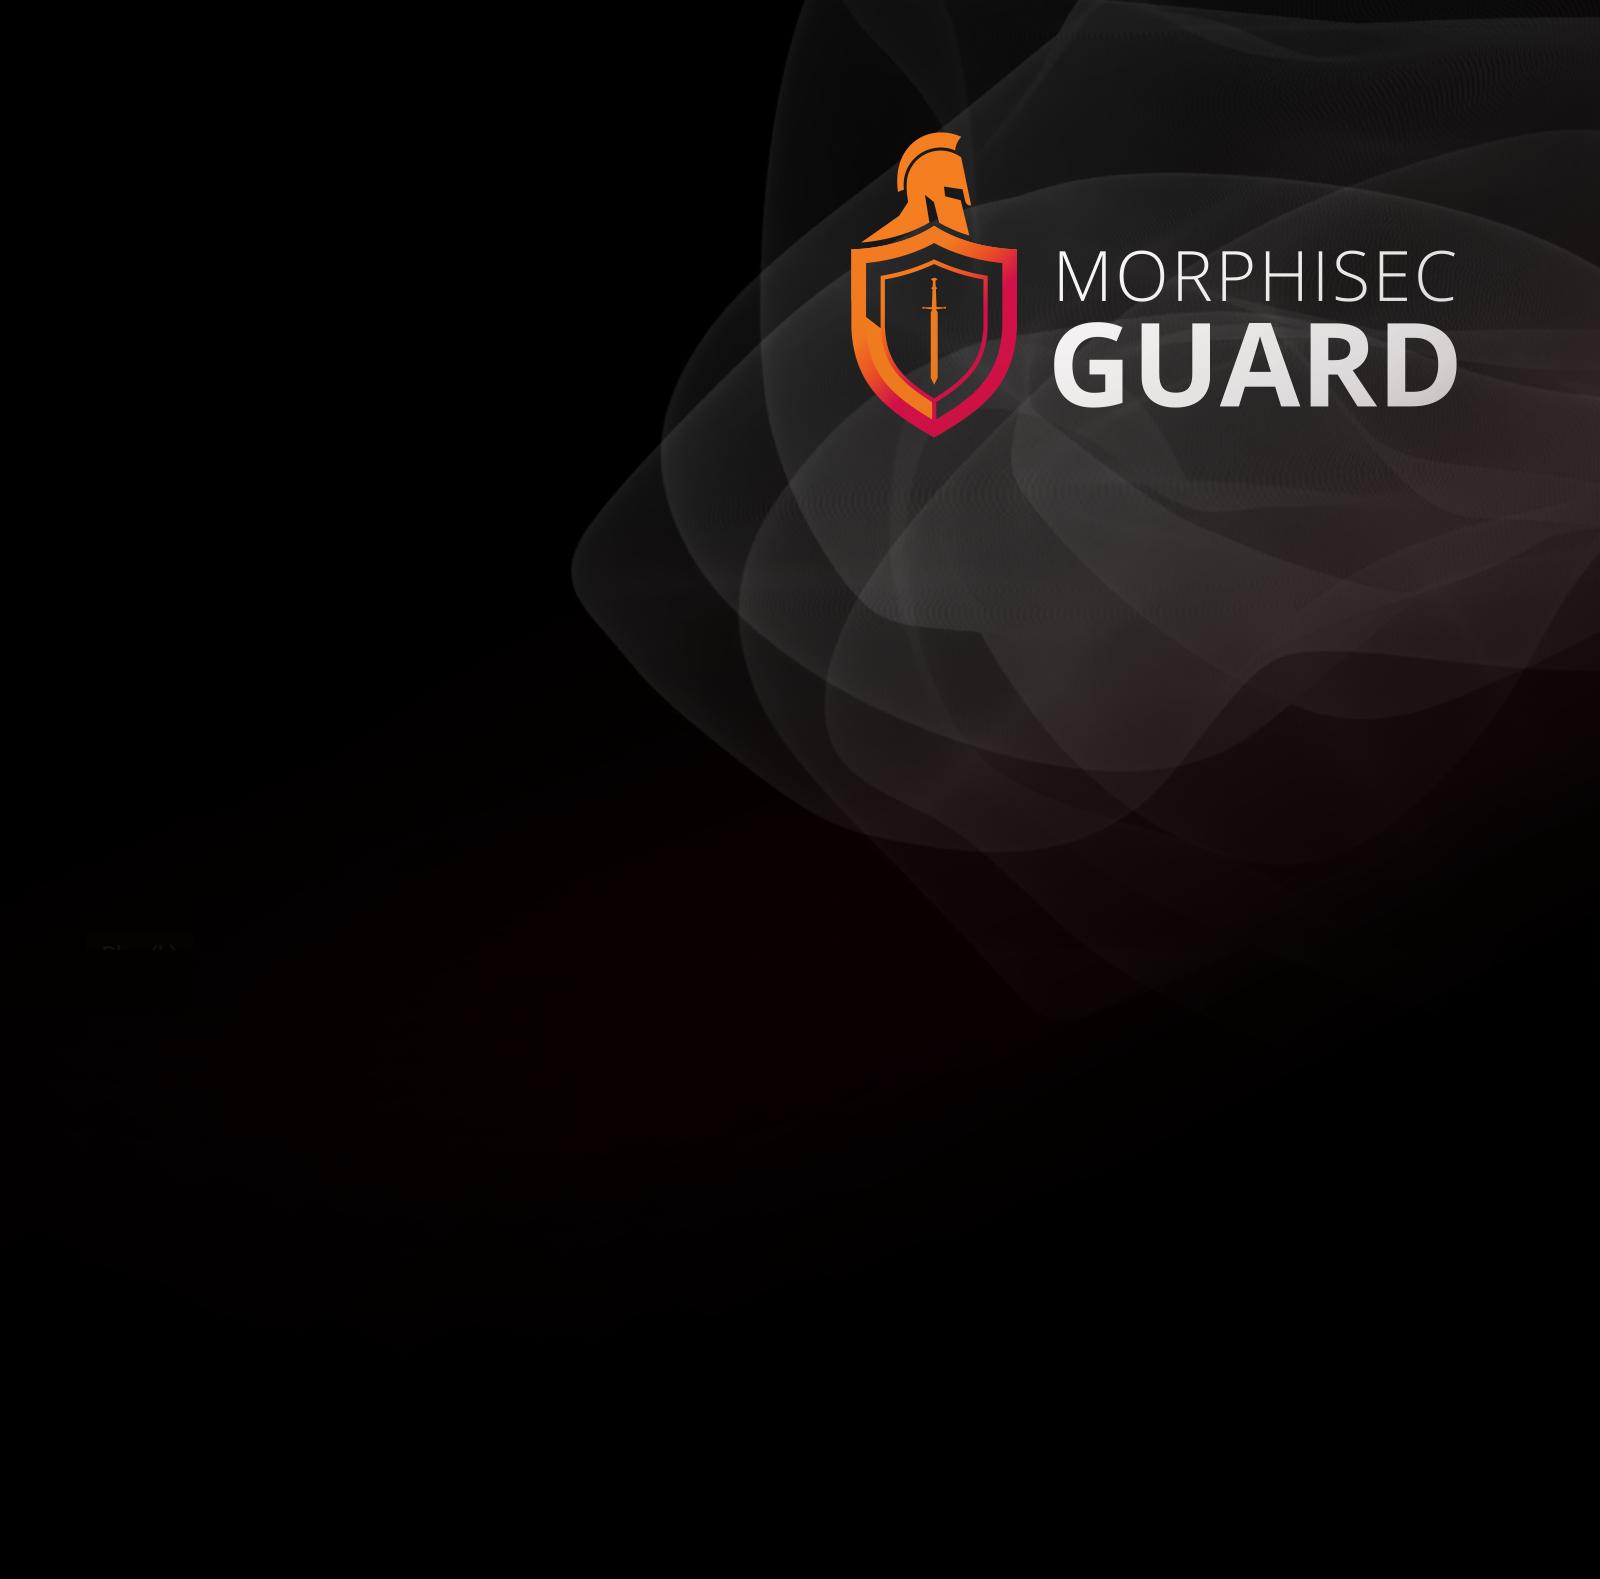 Morphisec Guard BG v1